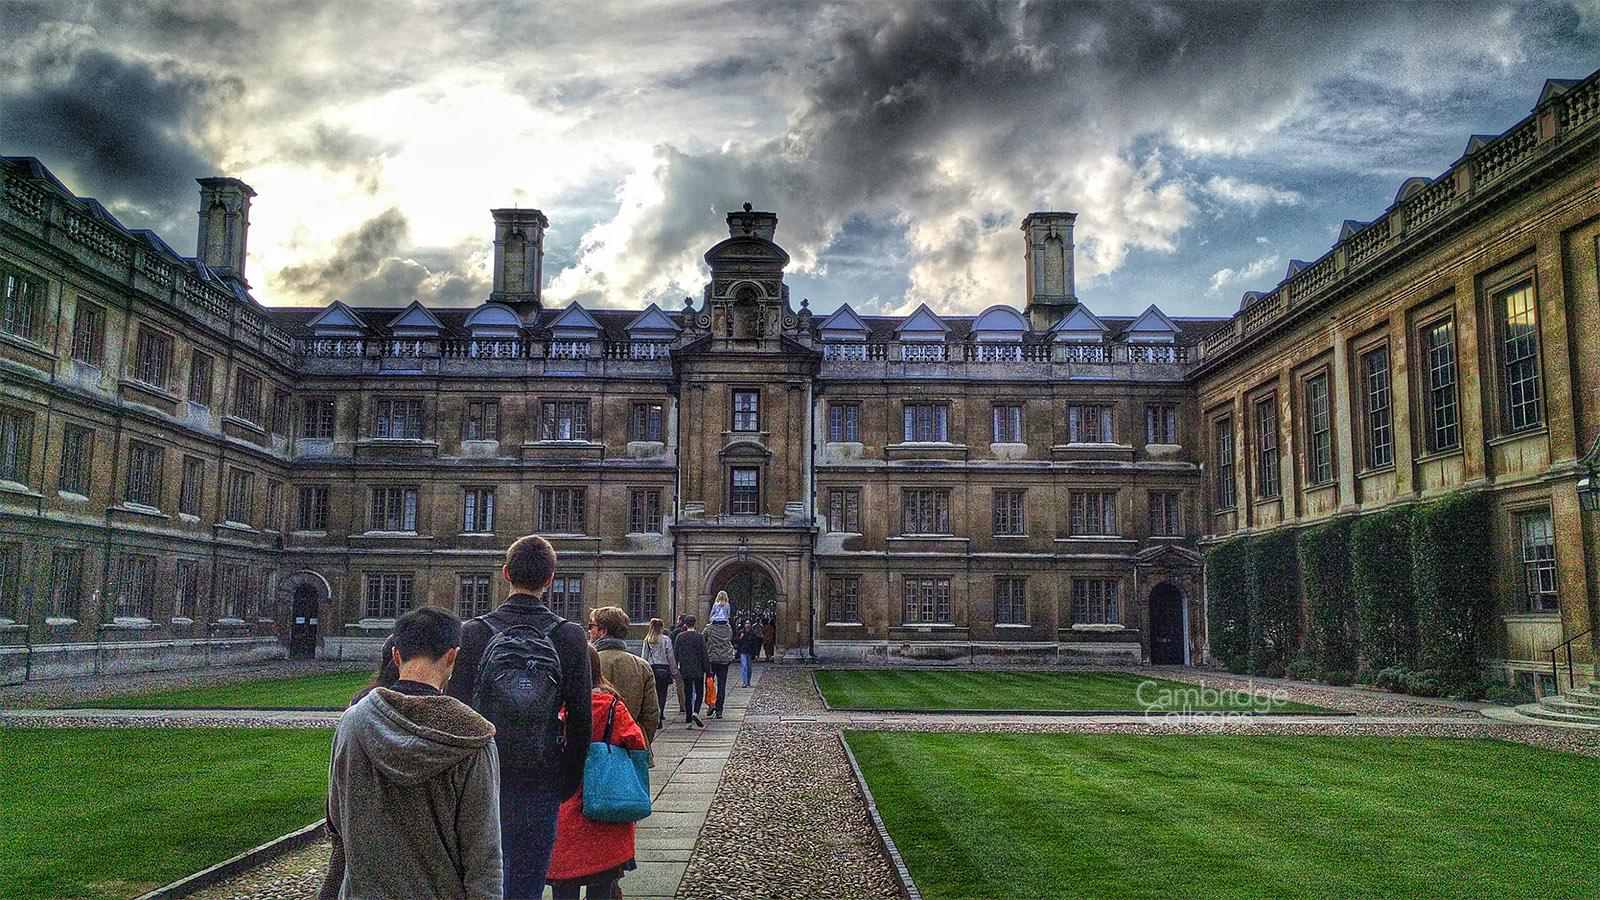 Clare collge Cambridge, Old court